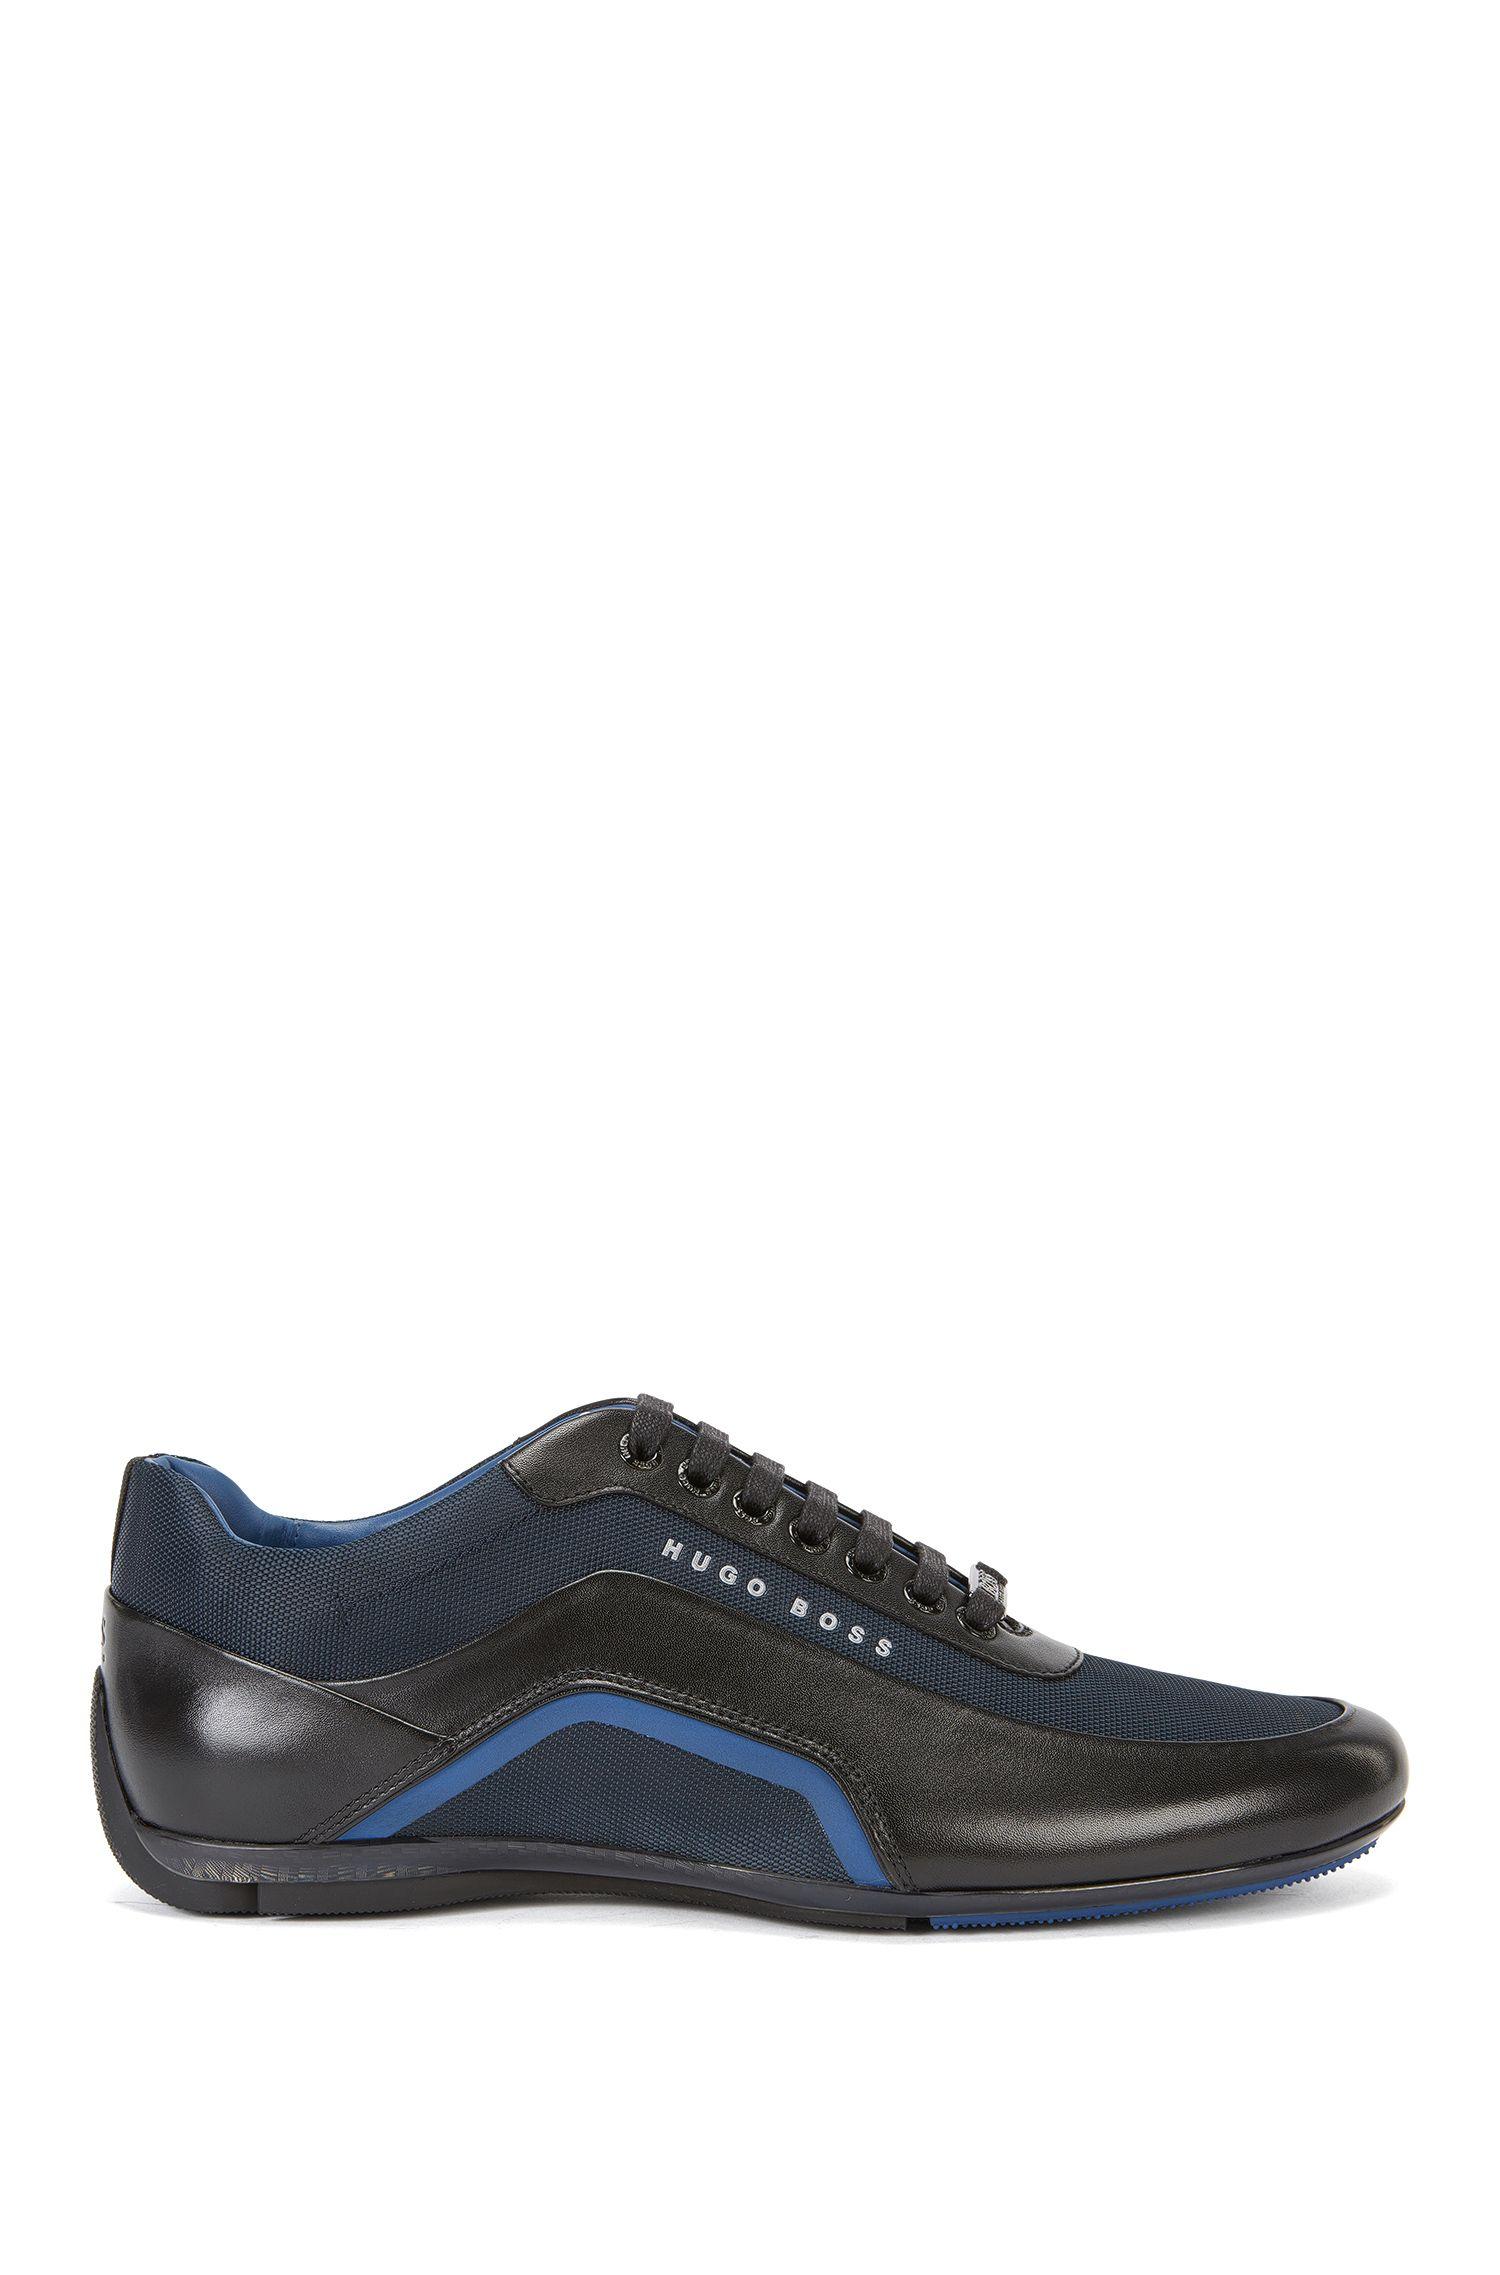 'HB Racing Lowp Itny' Calfskin Sneakers